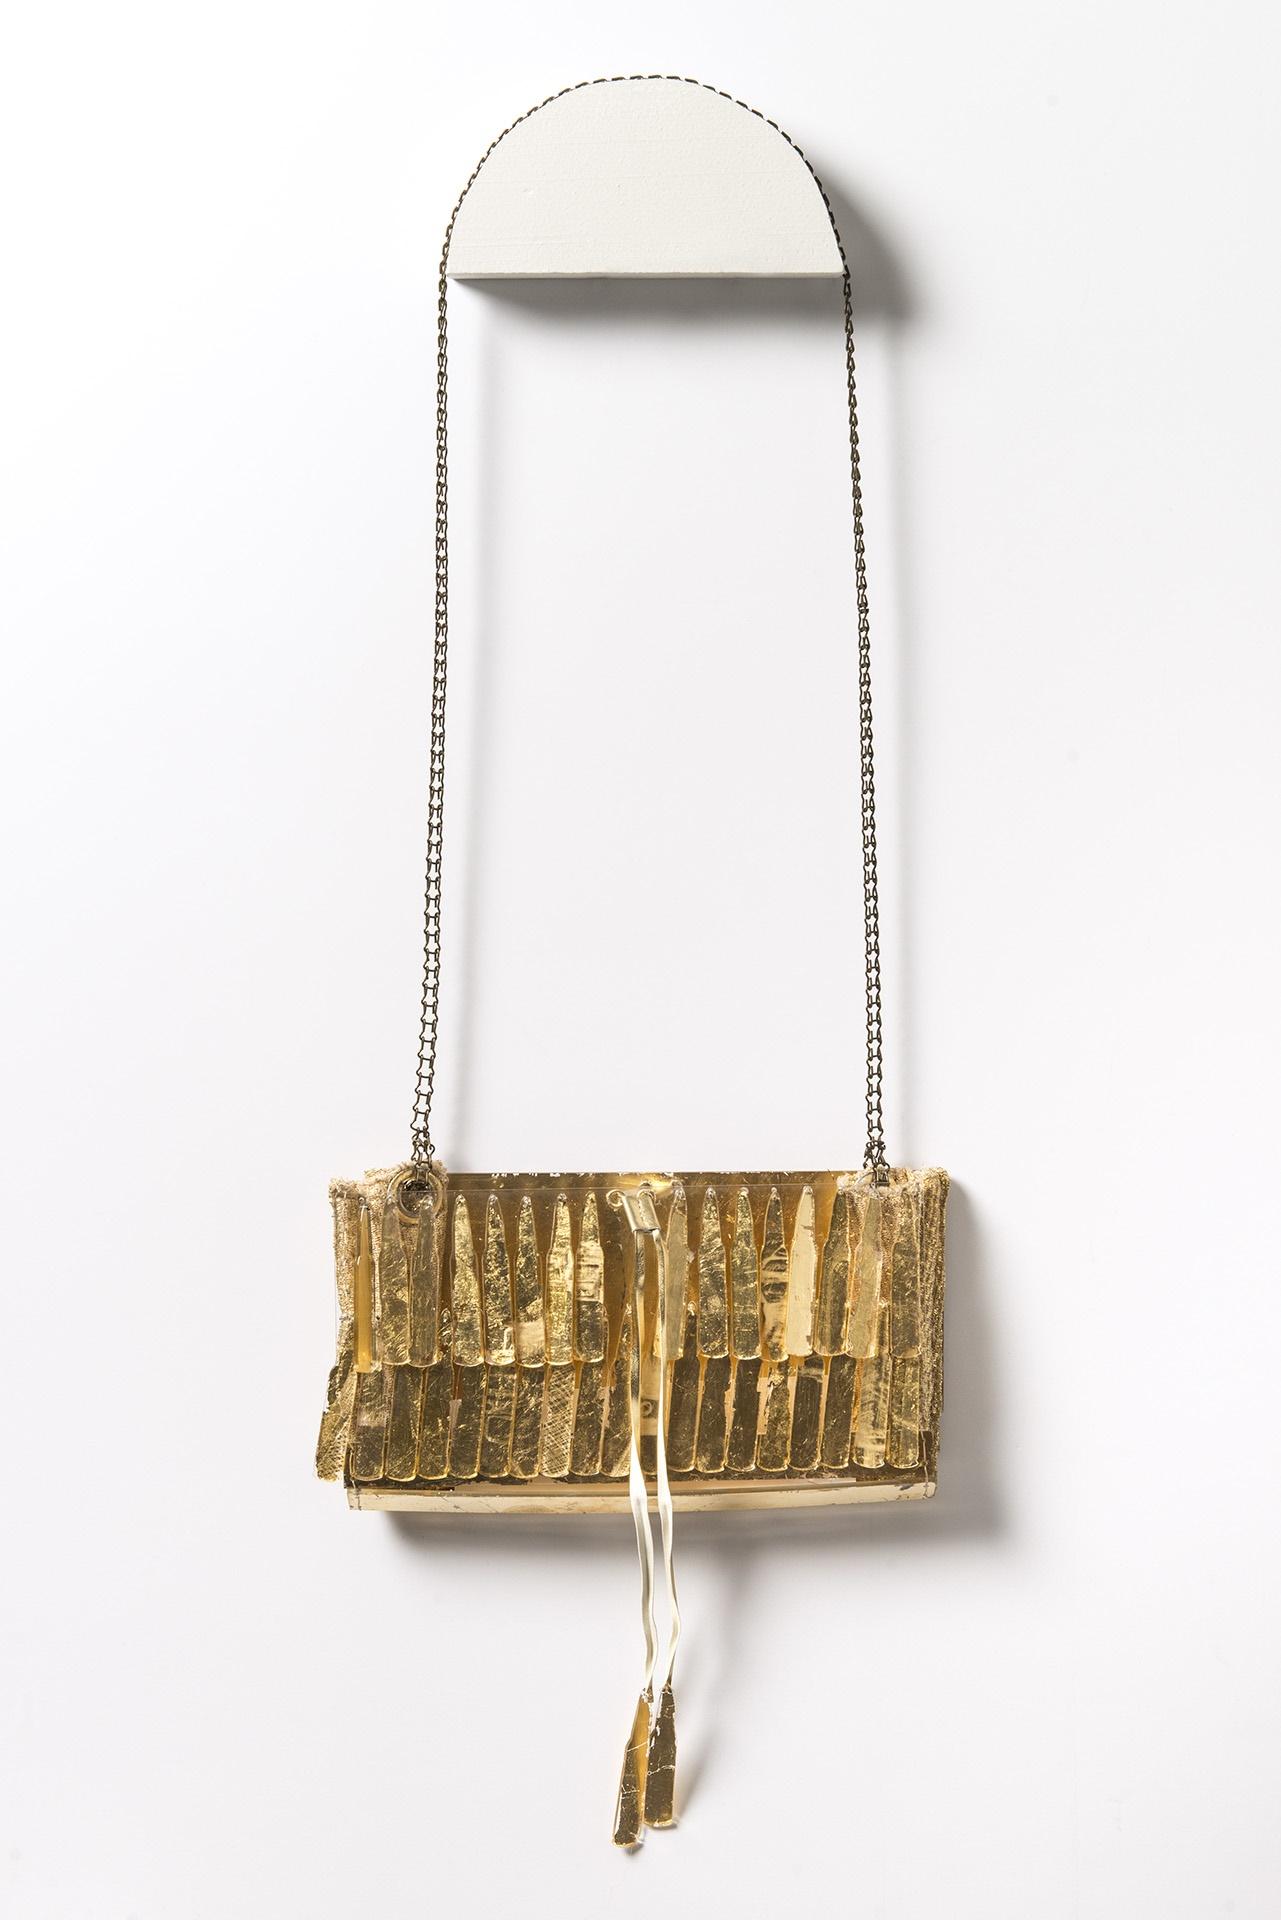 Gold Leafed bullets, ValerieMann_03-16-18_03.jpg